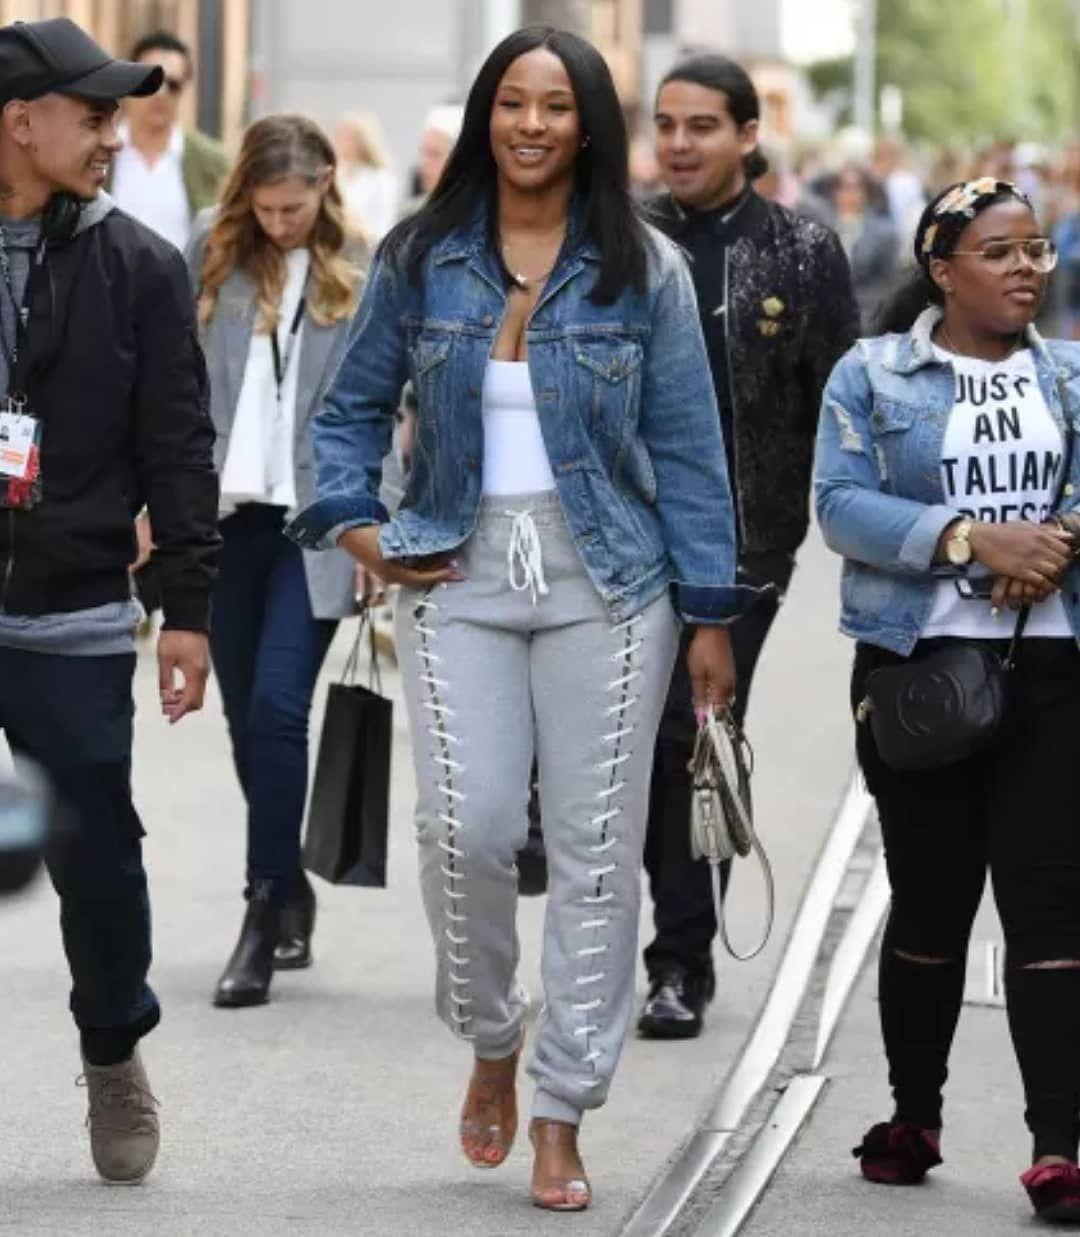 Pin By Taha Jackson On Nba Lebron James And Wife Comfortable Outfits Fashion